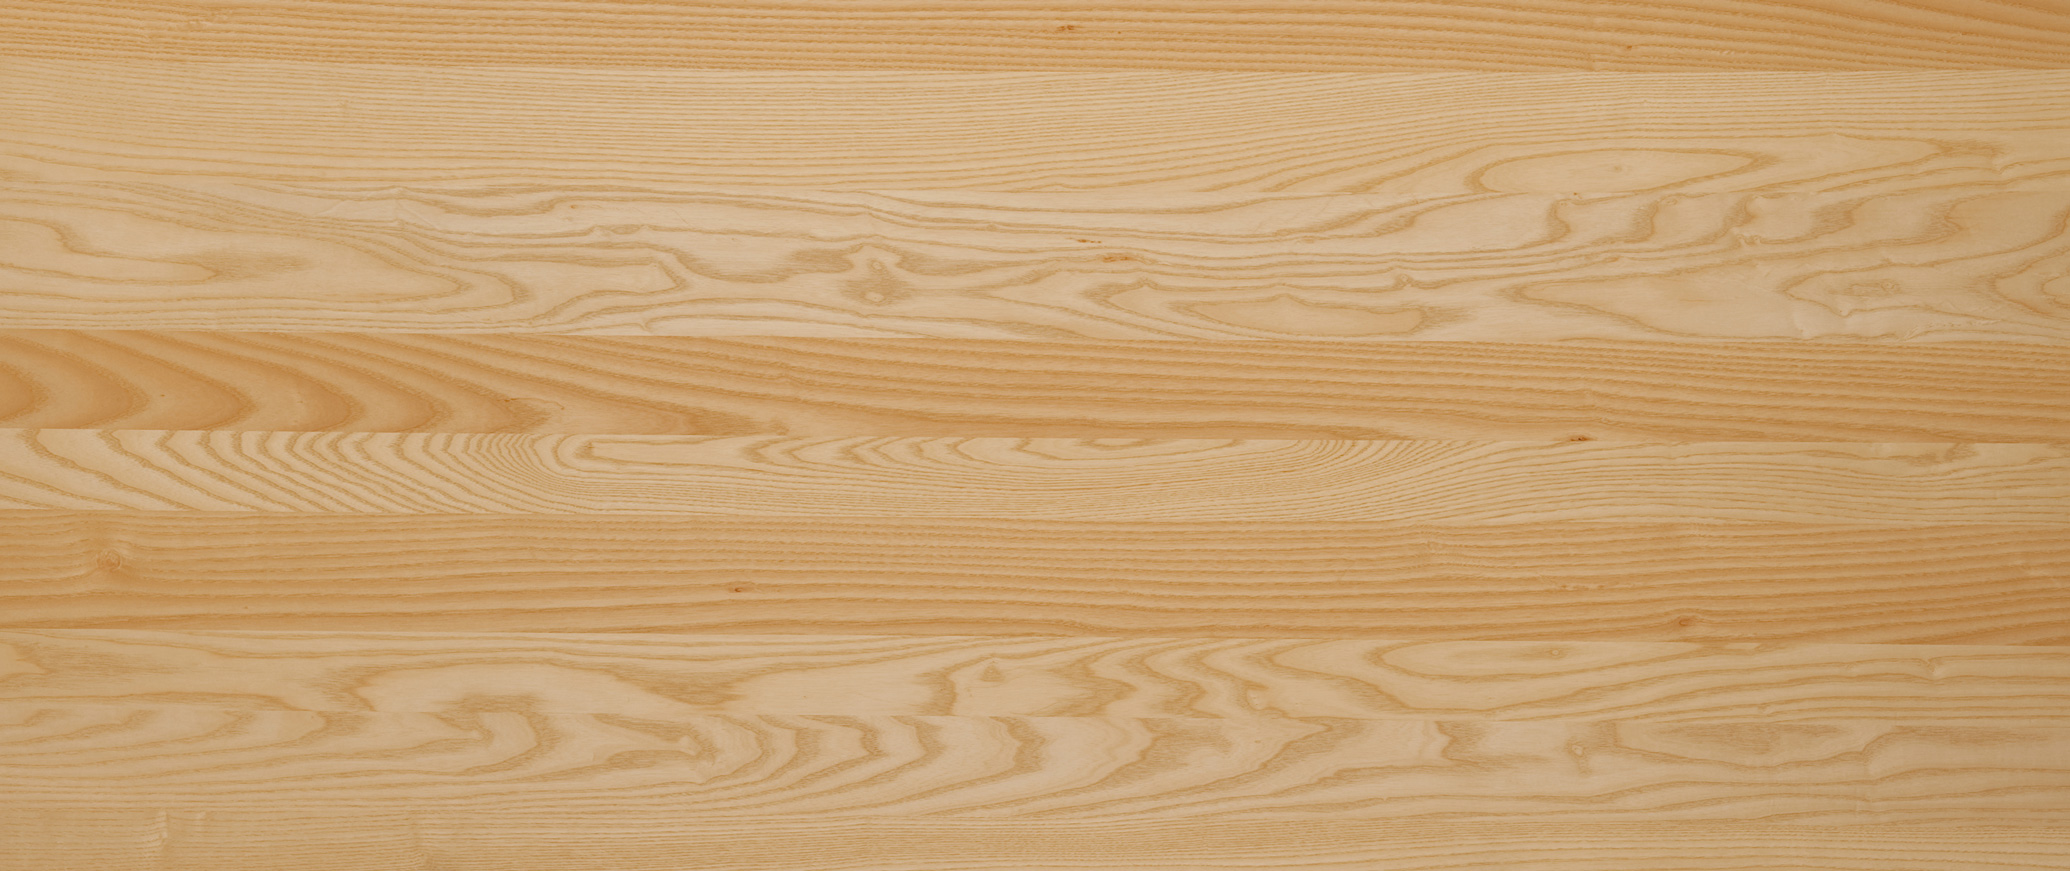 ash-random-plank_8009926619_o